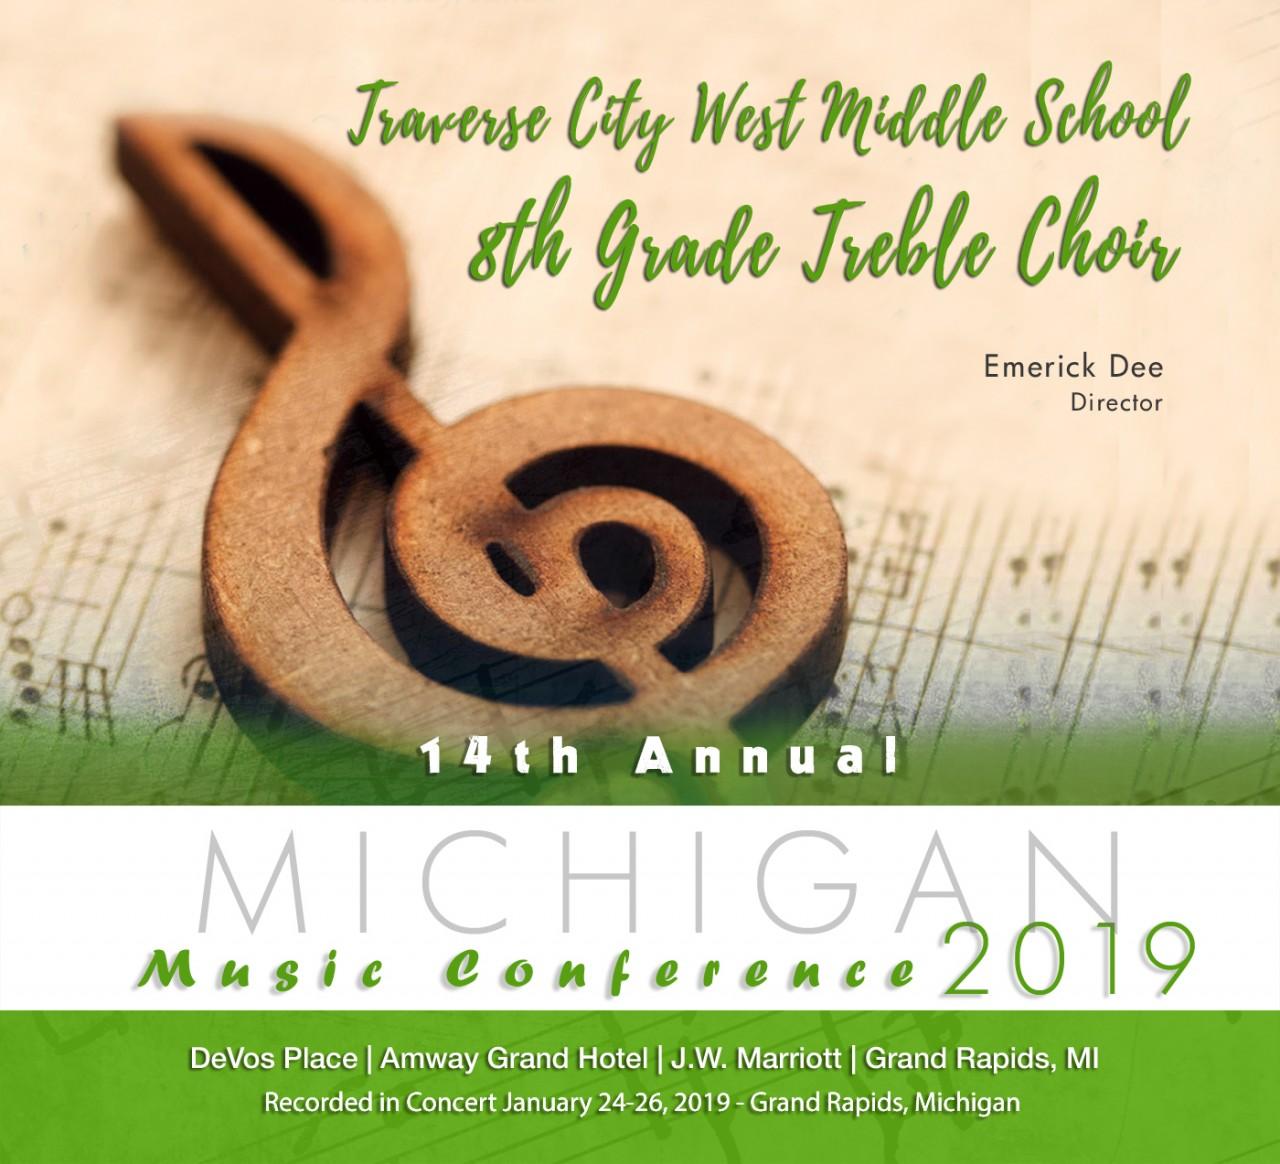 Michigan MMEA 2019 Traverse City West Middle School 8th Grade Treble